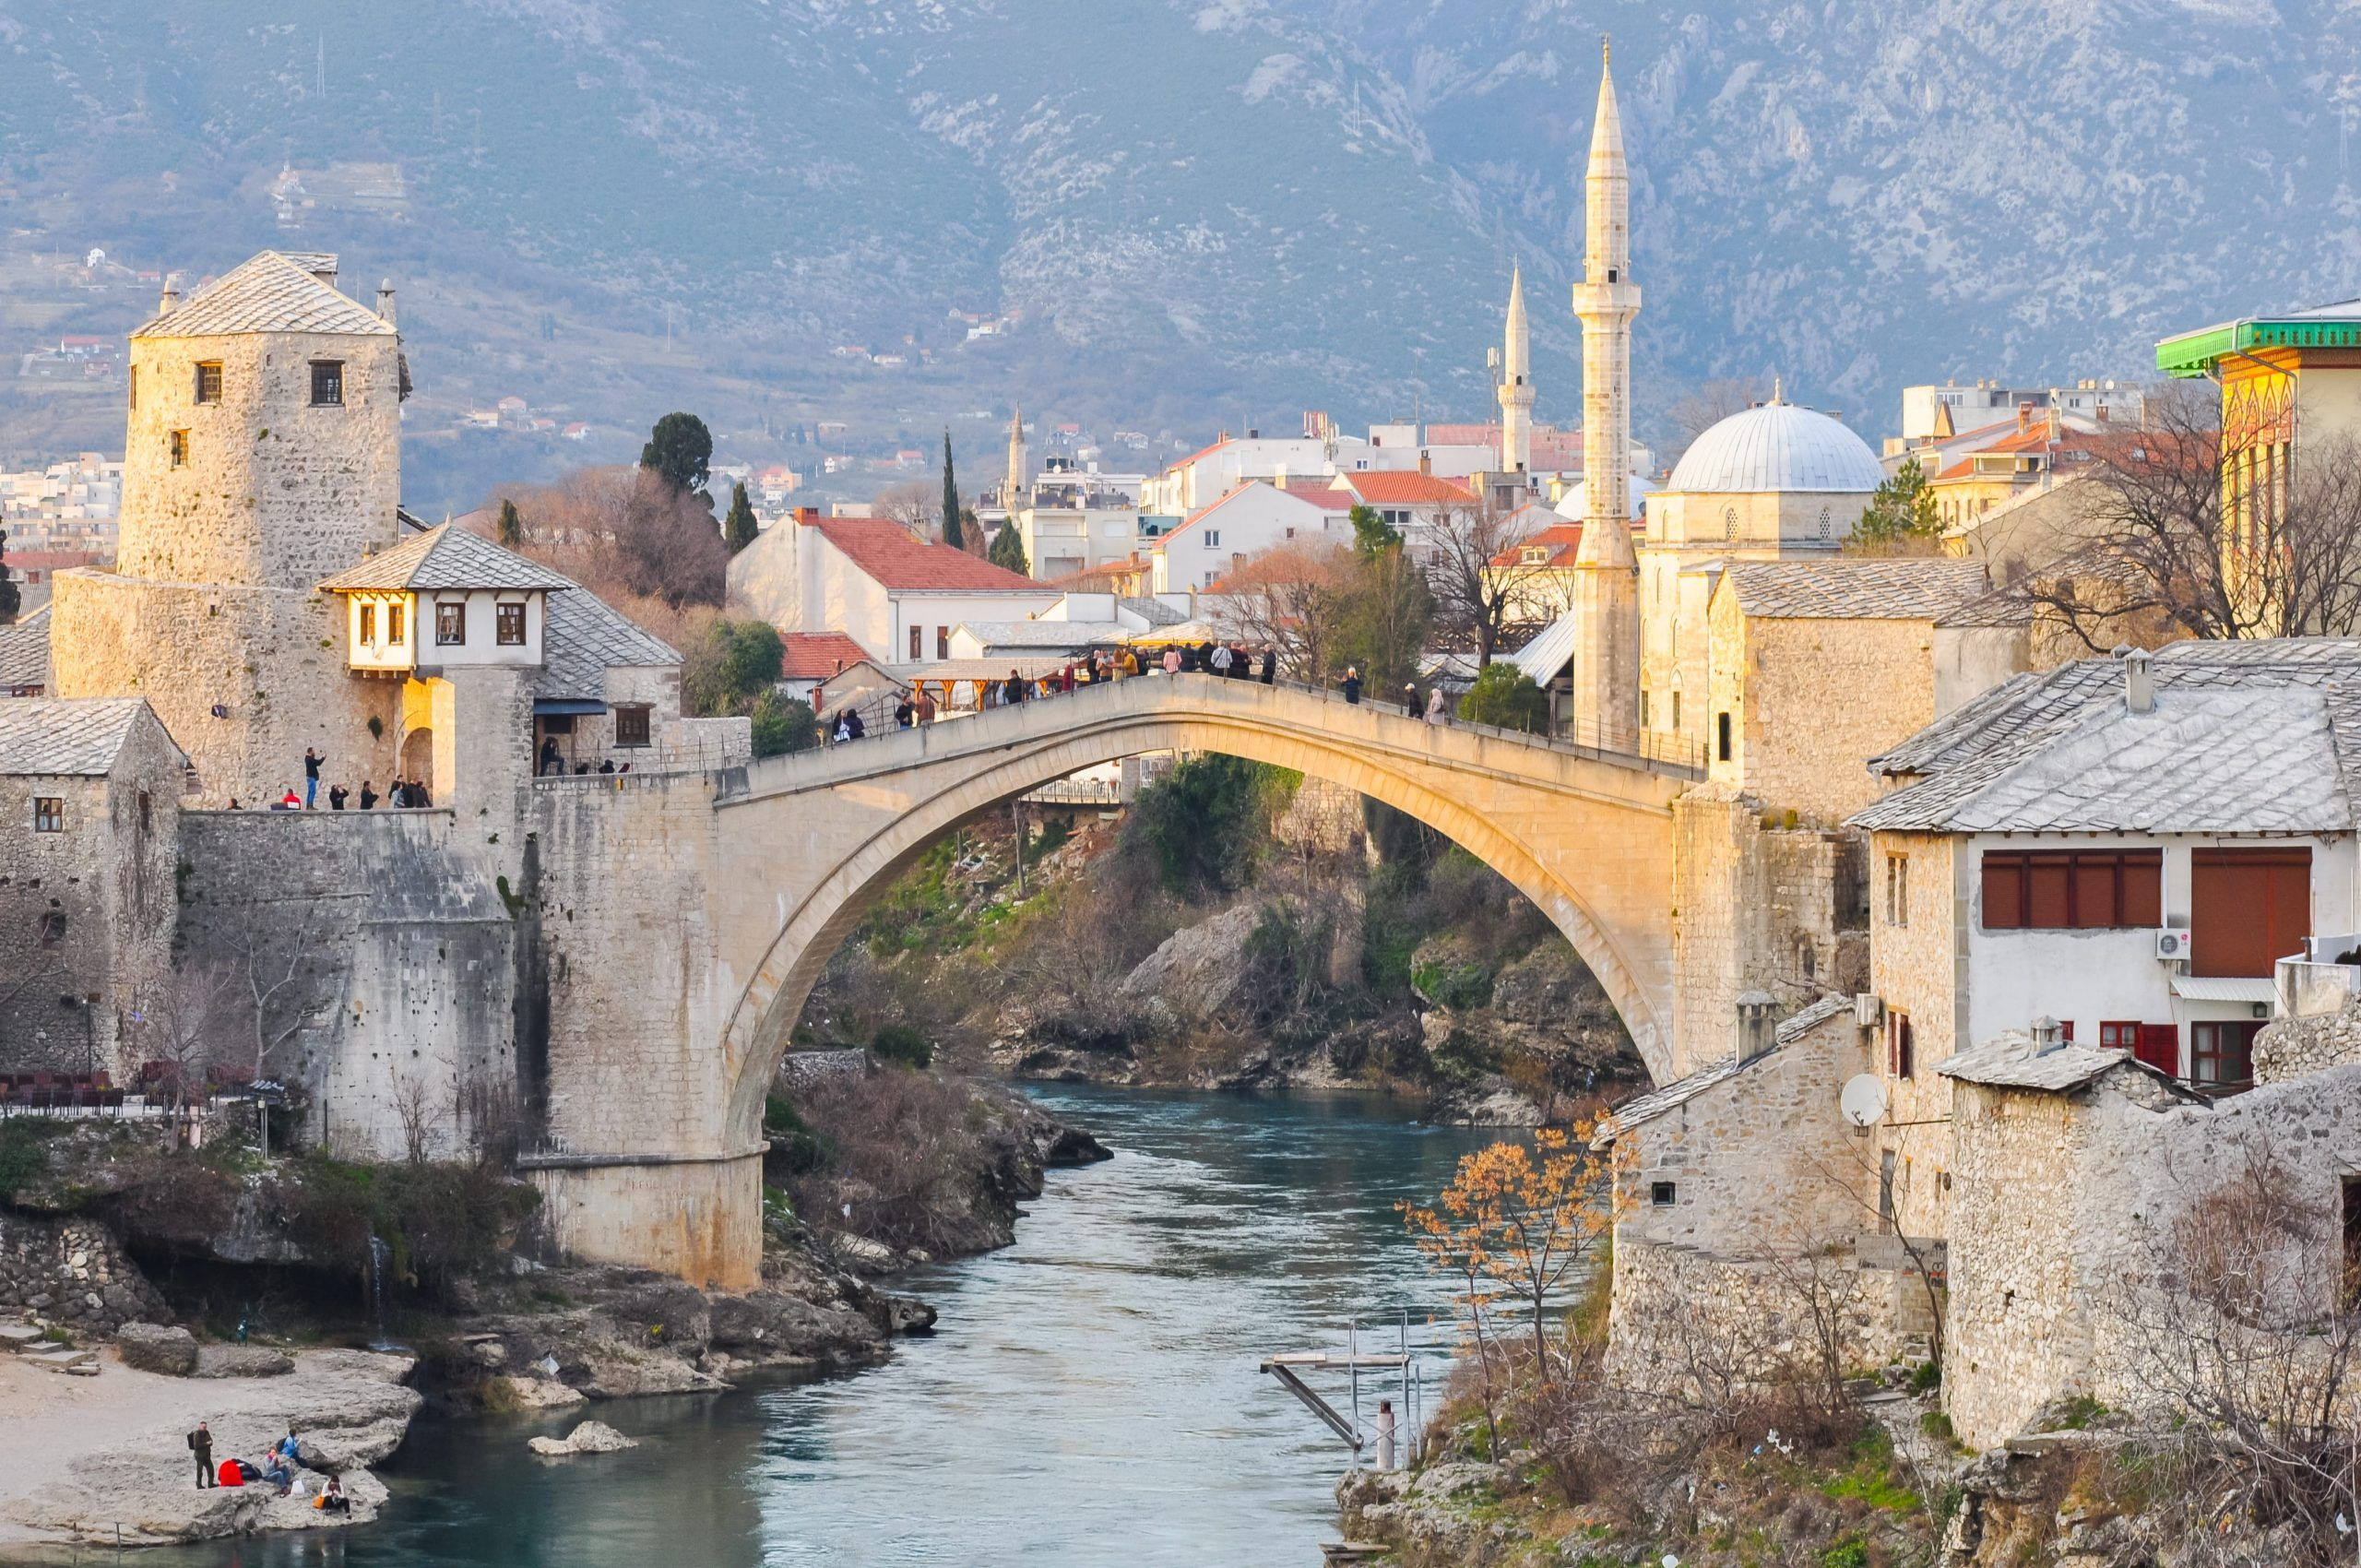 Mostat Old Bridge - Mostat tour